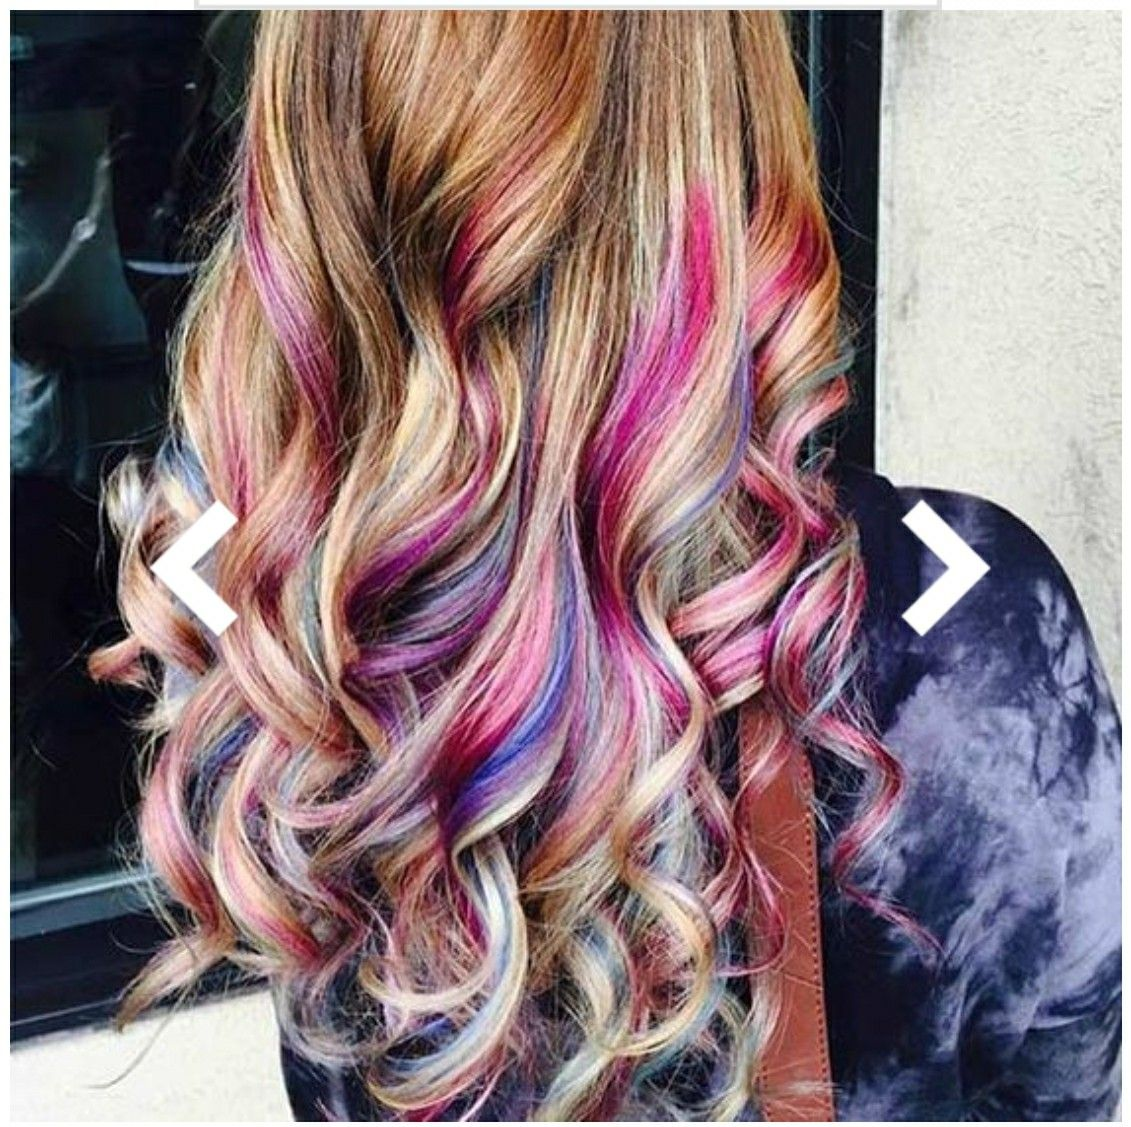 Pin by mary on hair color ideas pinterest hair purple hair and